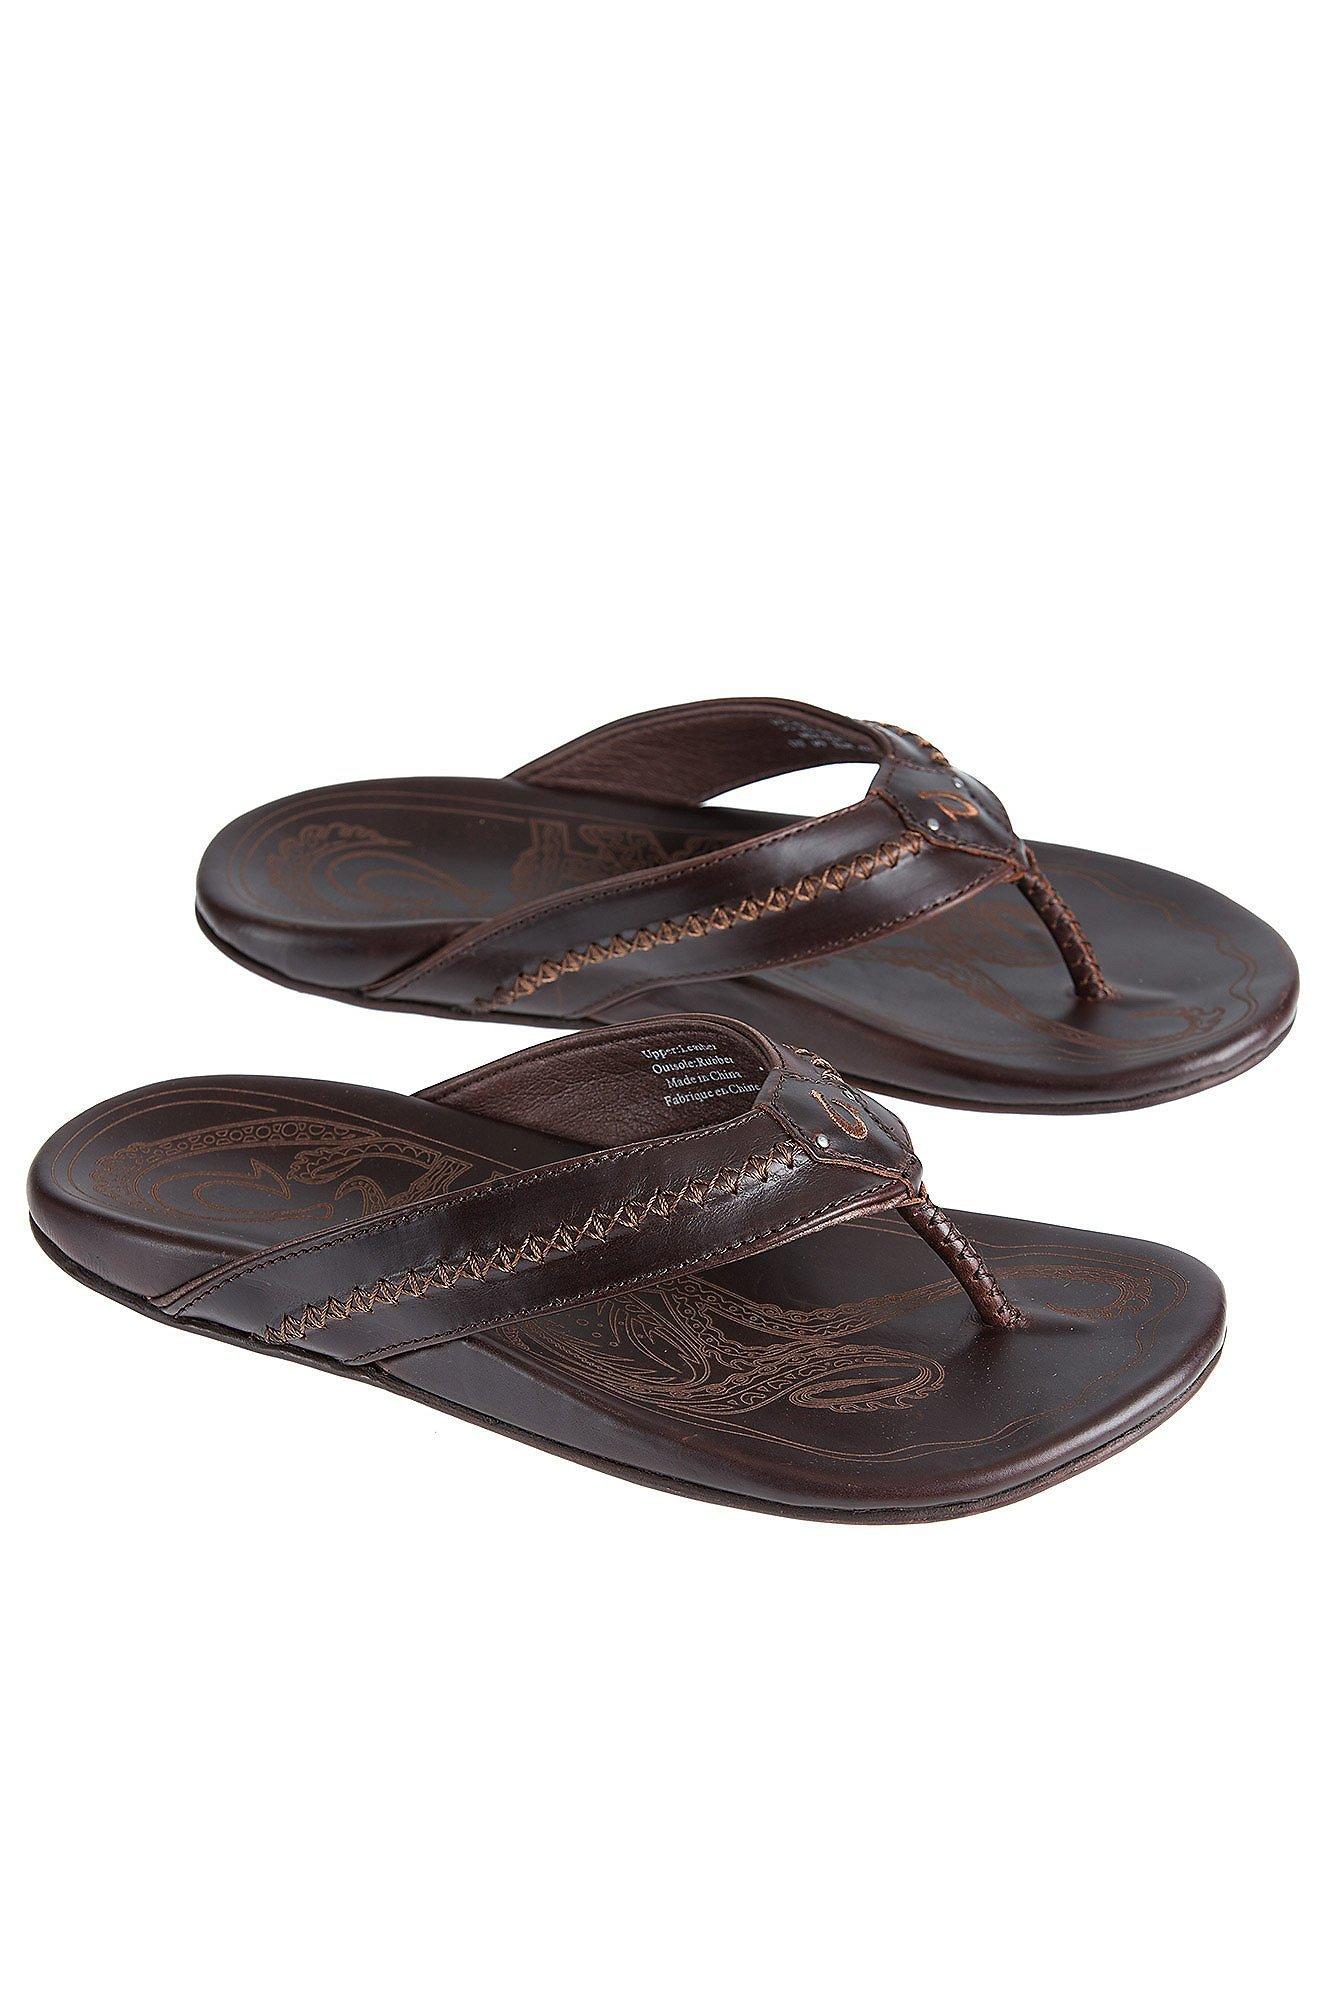 Men's OluKai Mea Ola Leather Sandals, DARK JAVA/DARK JAVA, Size 14